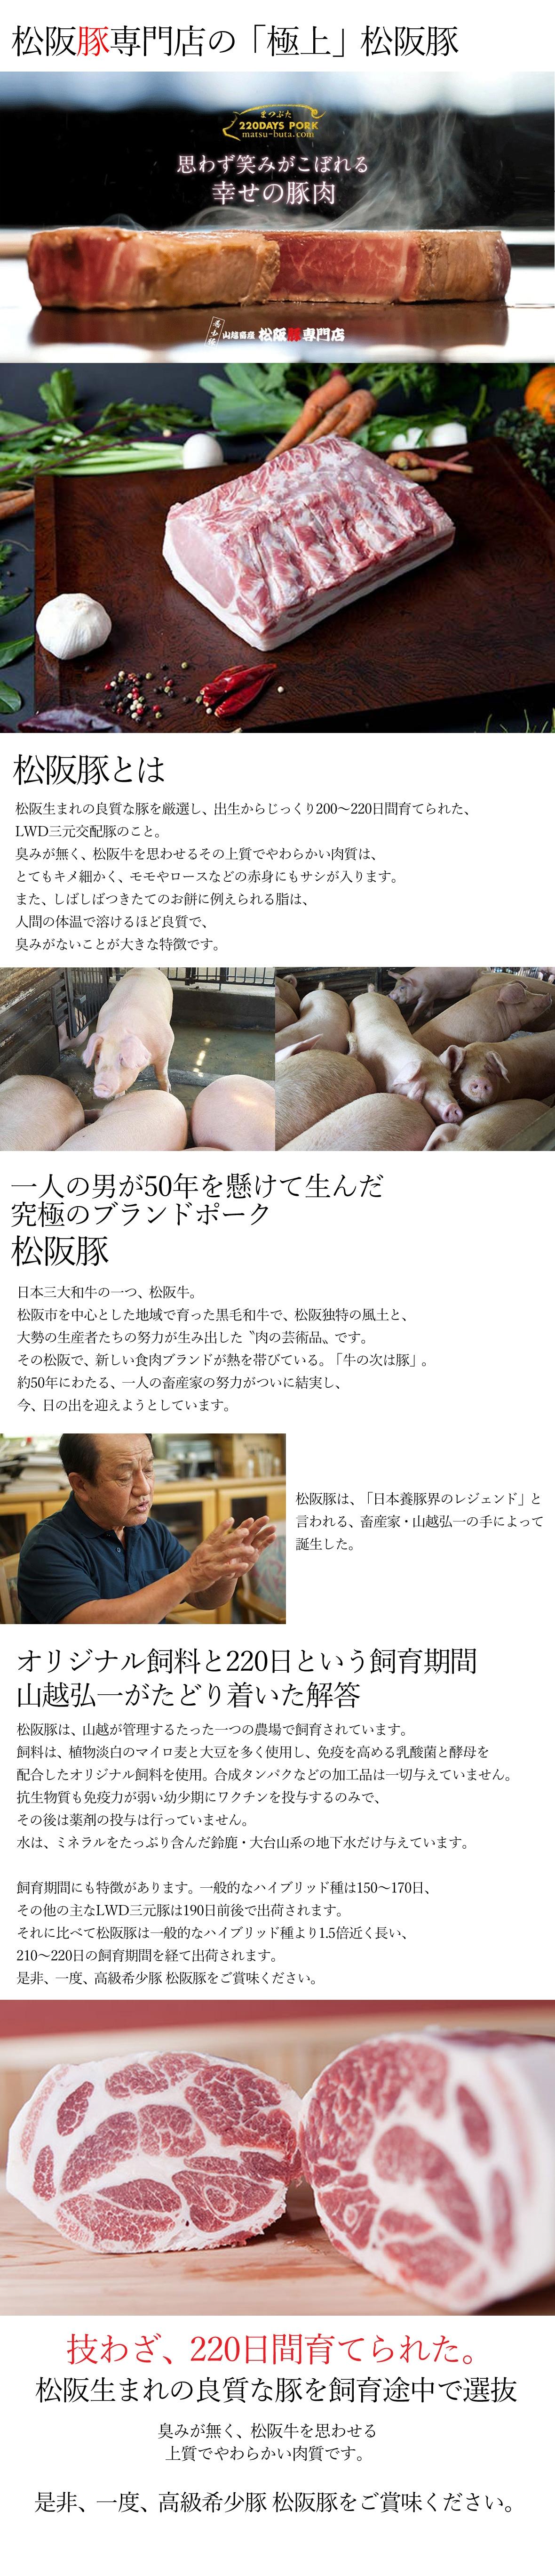 LP_ワイドバナー_松阪豚